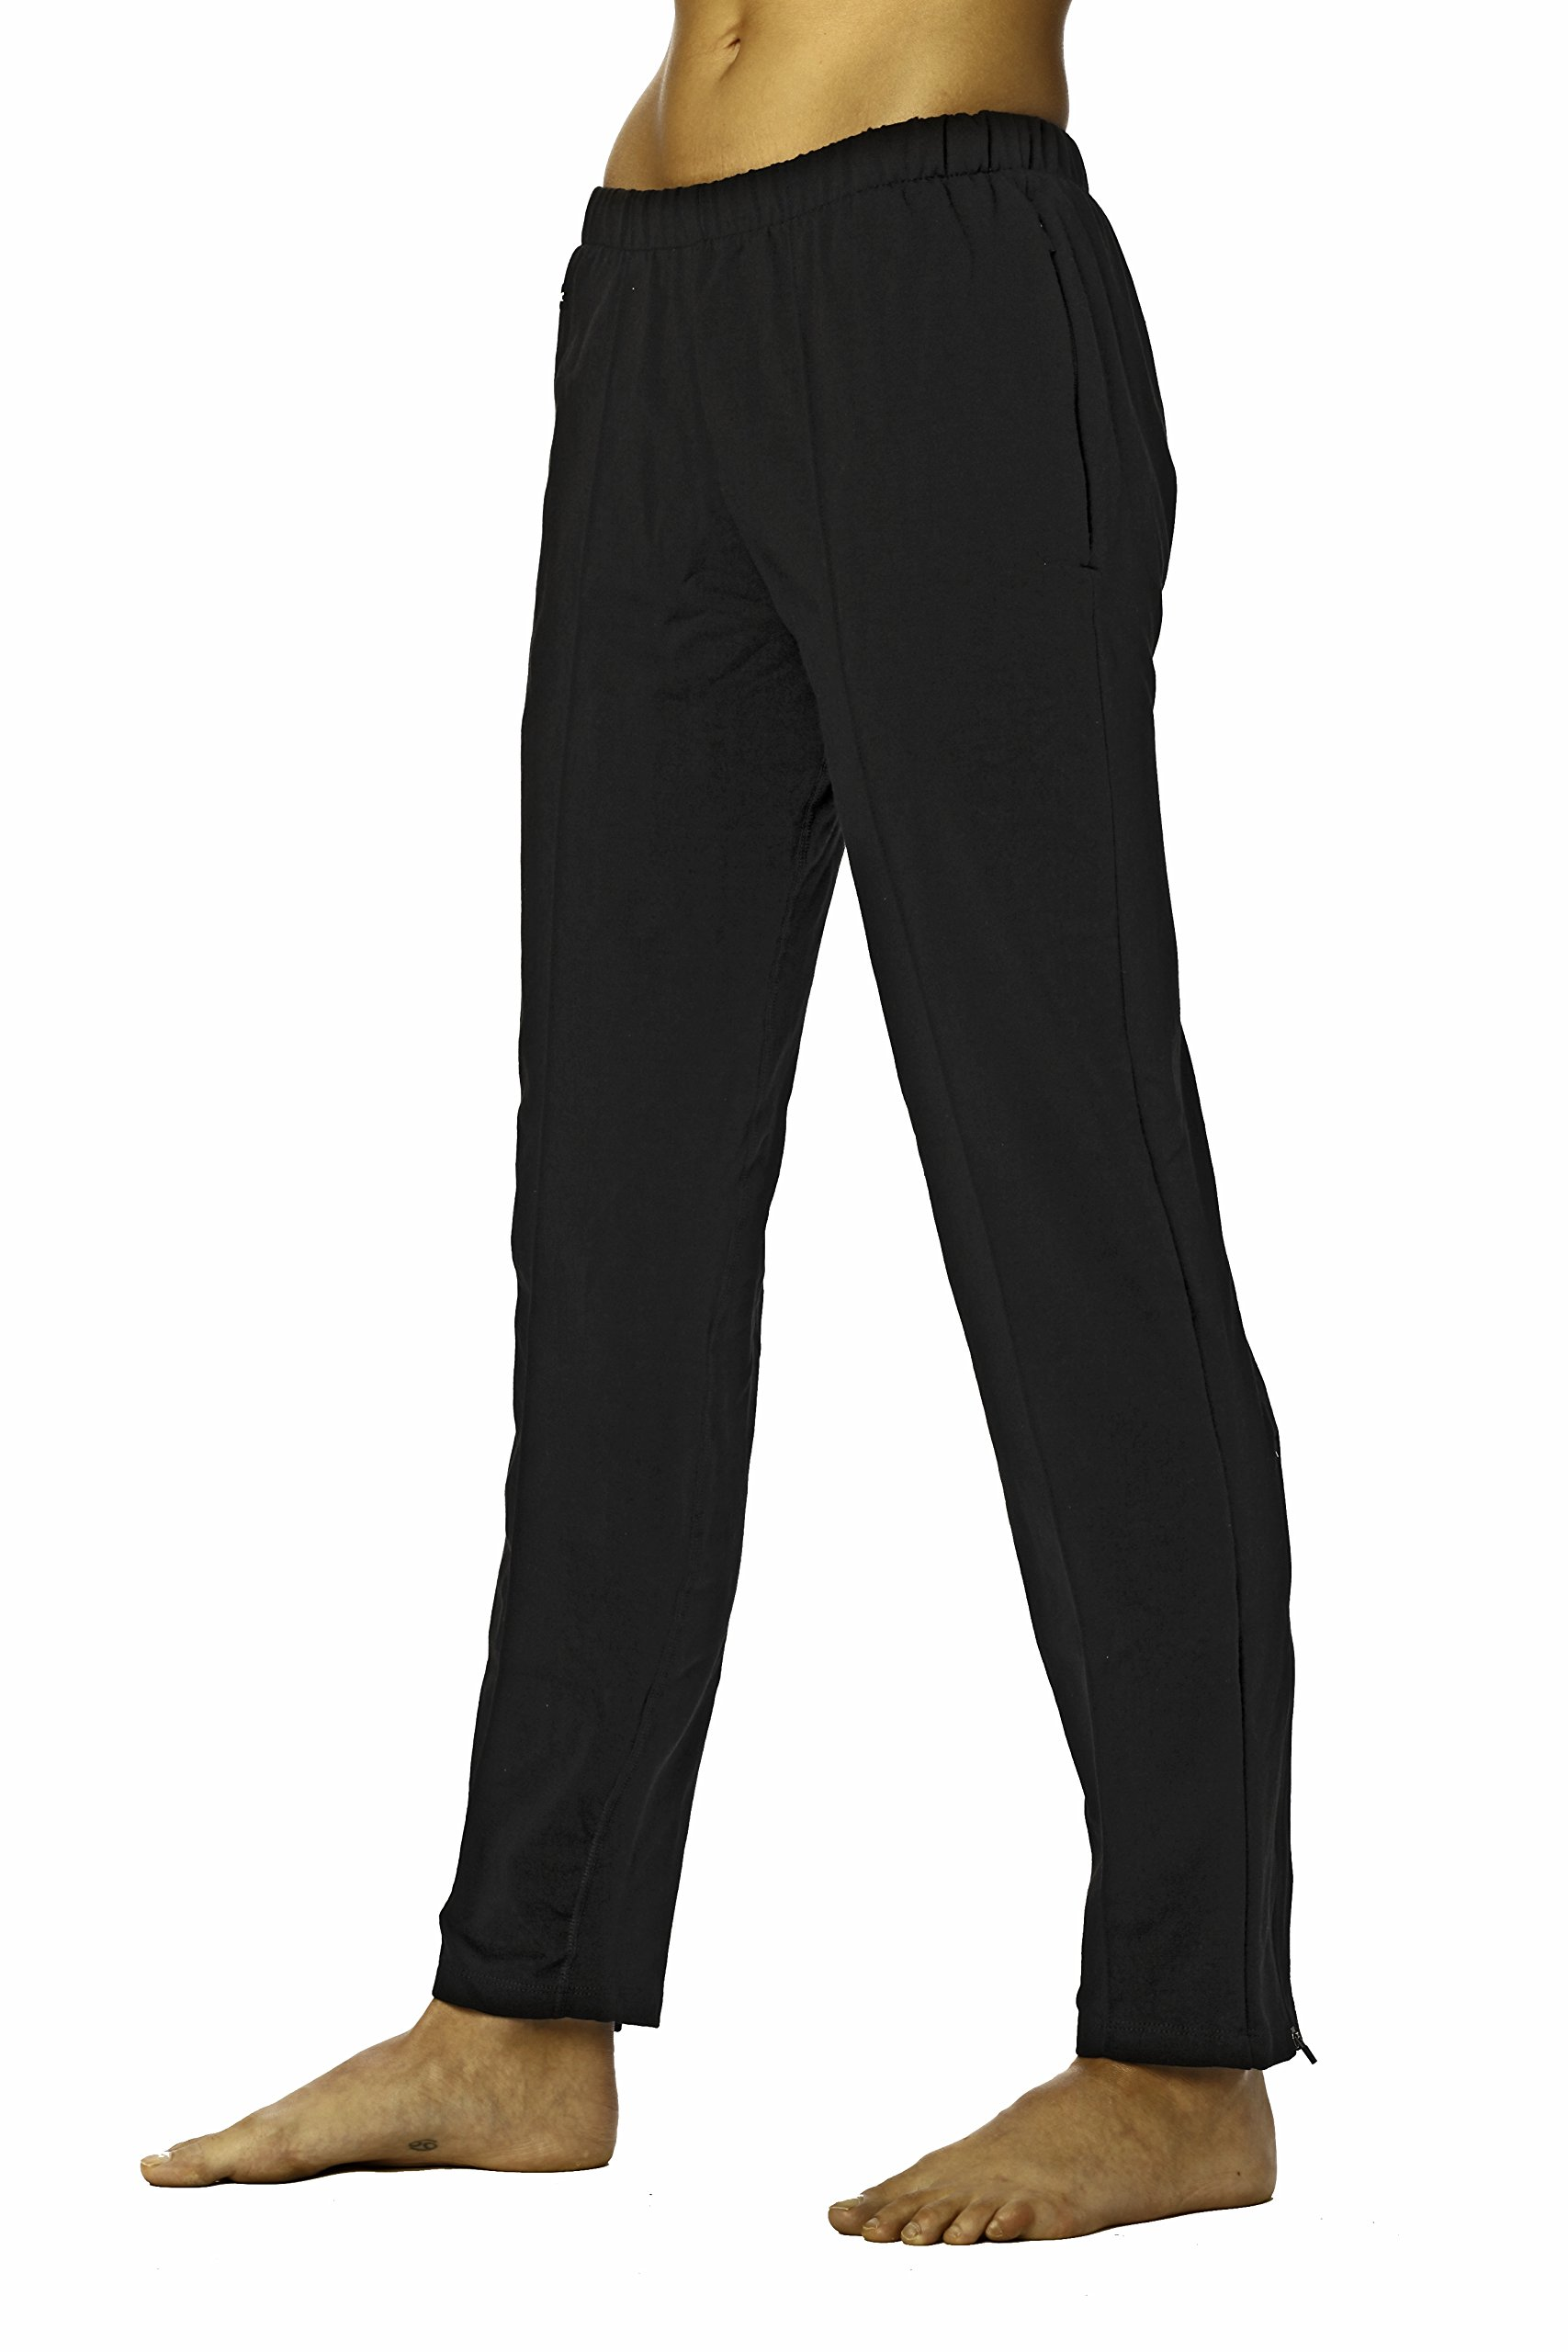 Sporthill Women's XC Pant (Black, Large)